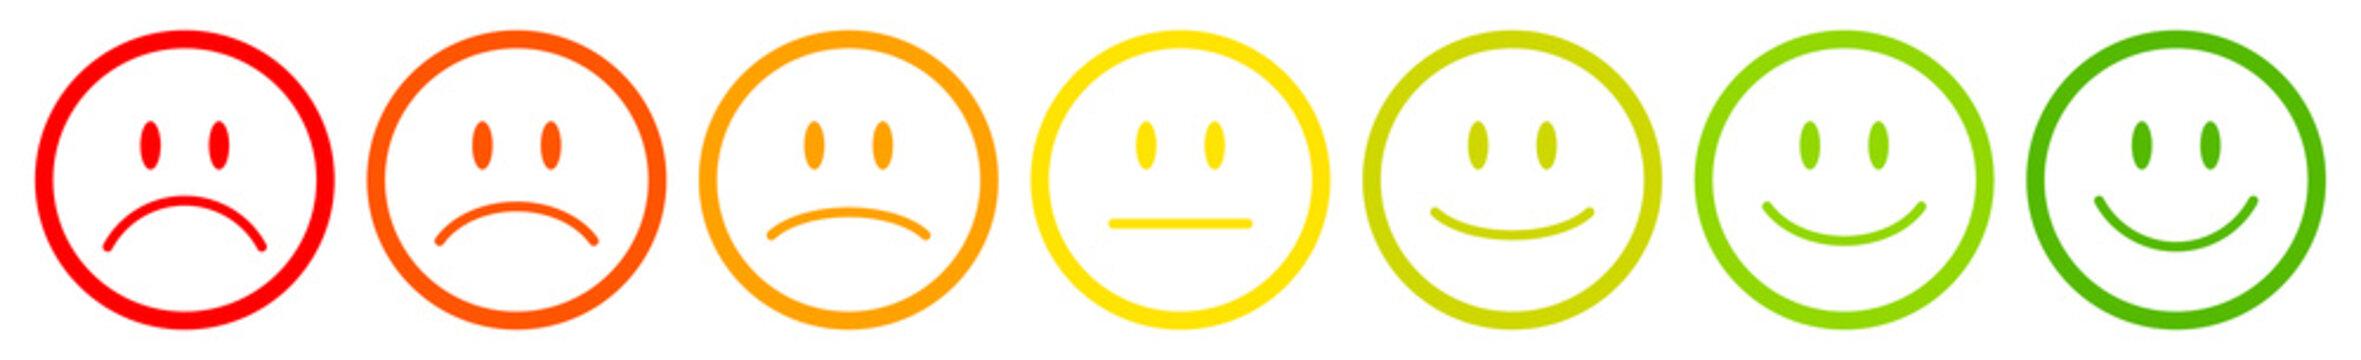 7 Color Faces Outline Feedback/Mood